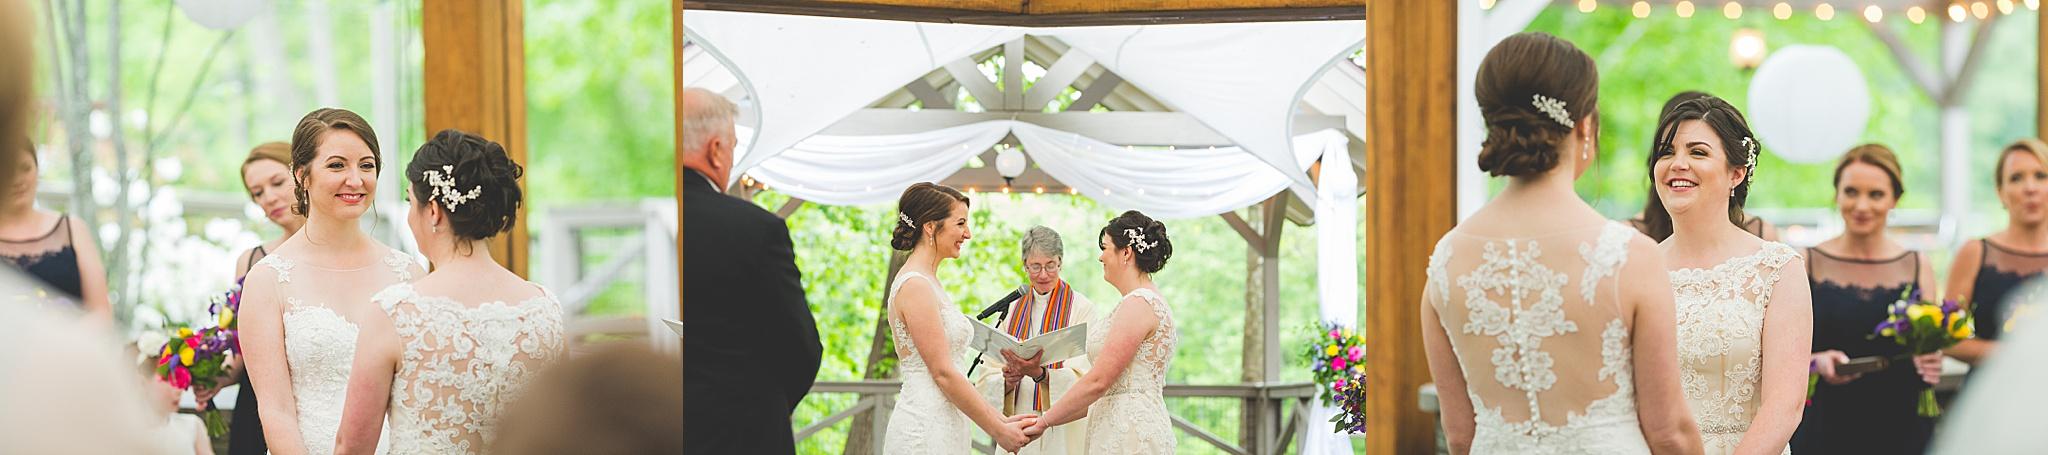 Albany_Wedding_Photographer_7369.jpg